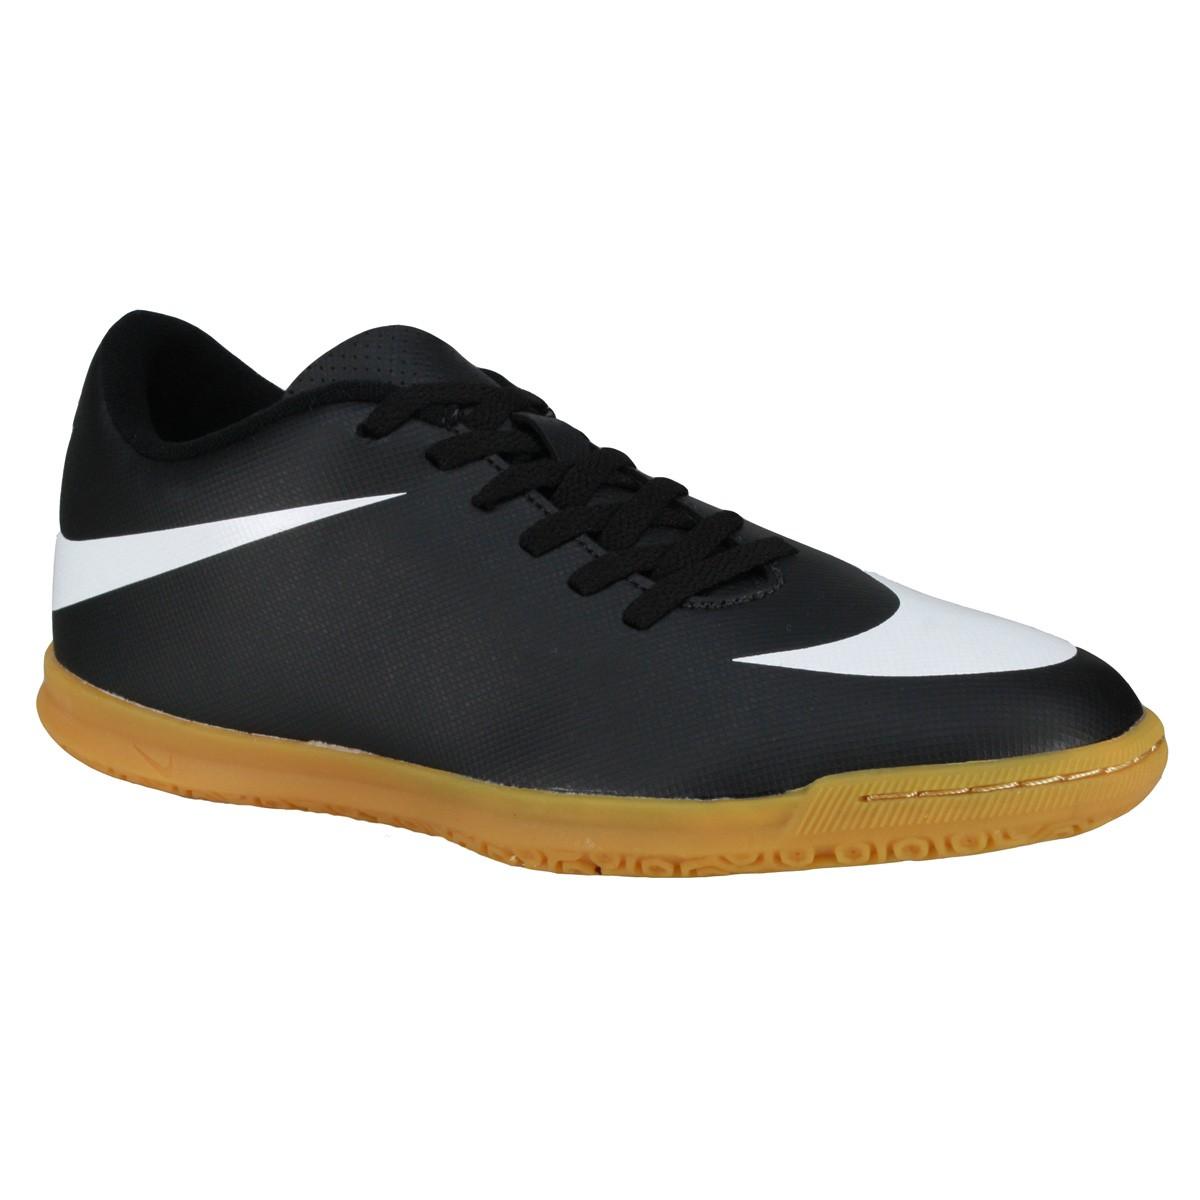 908e0d672b Amplie a imagem. Chuteira Nike Futsal Bravata IC  Chuteira Nike Futsal  Bravata IC  Chuteira Nike Futsal Bravata ...